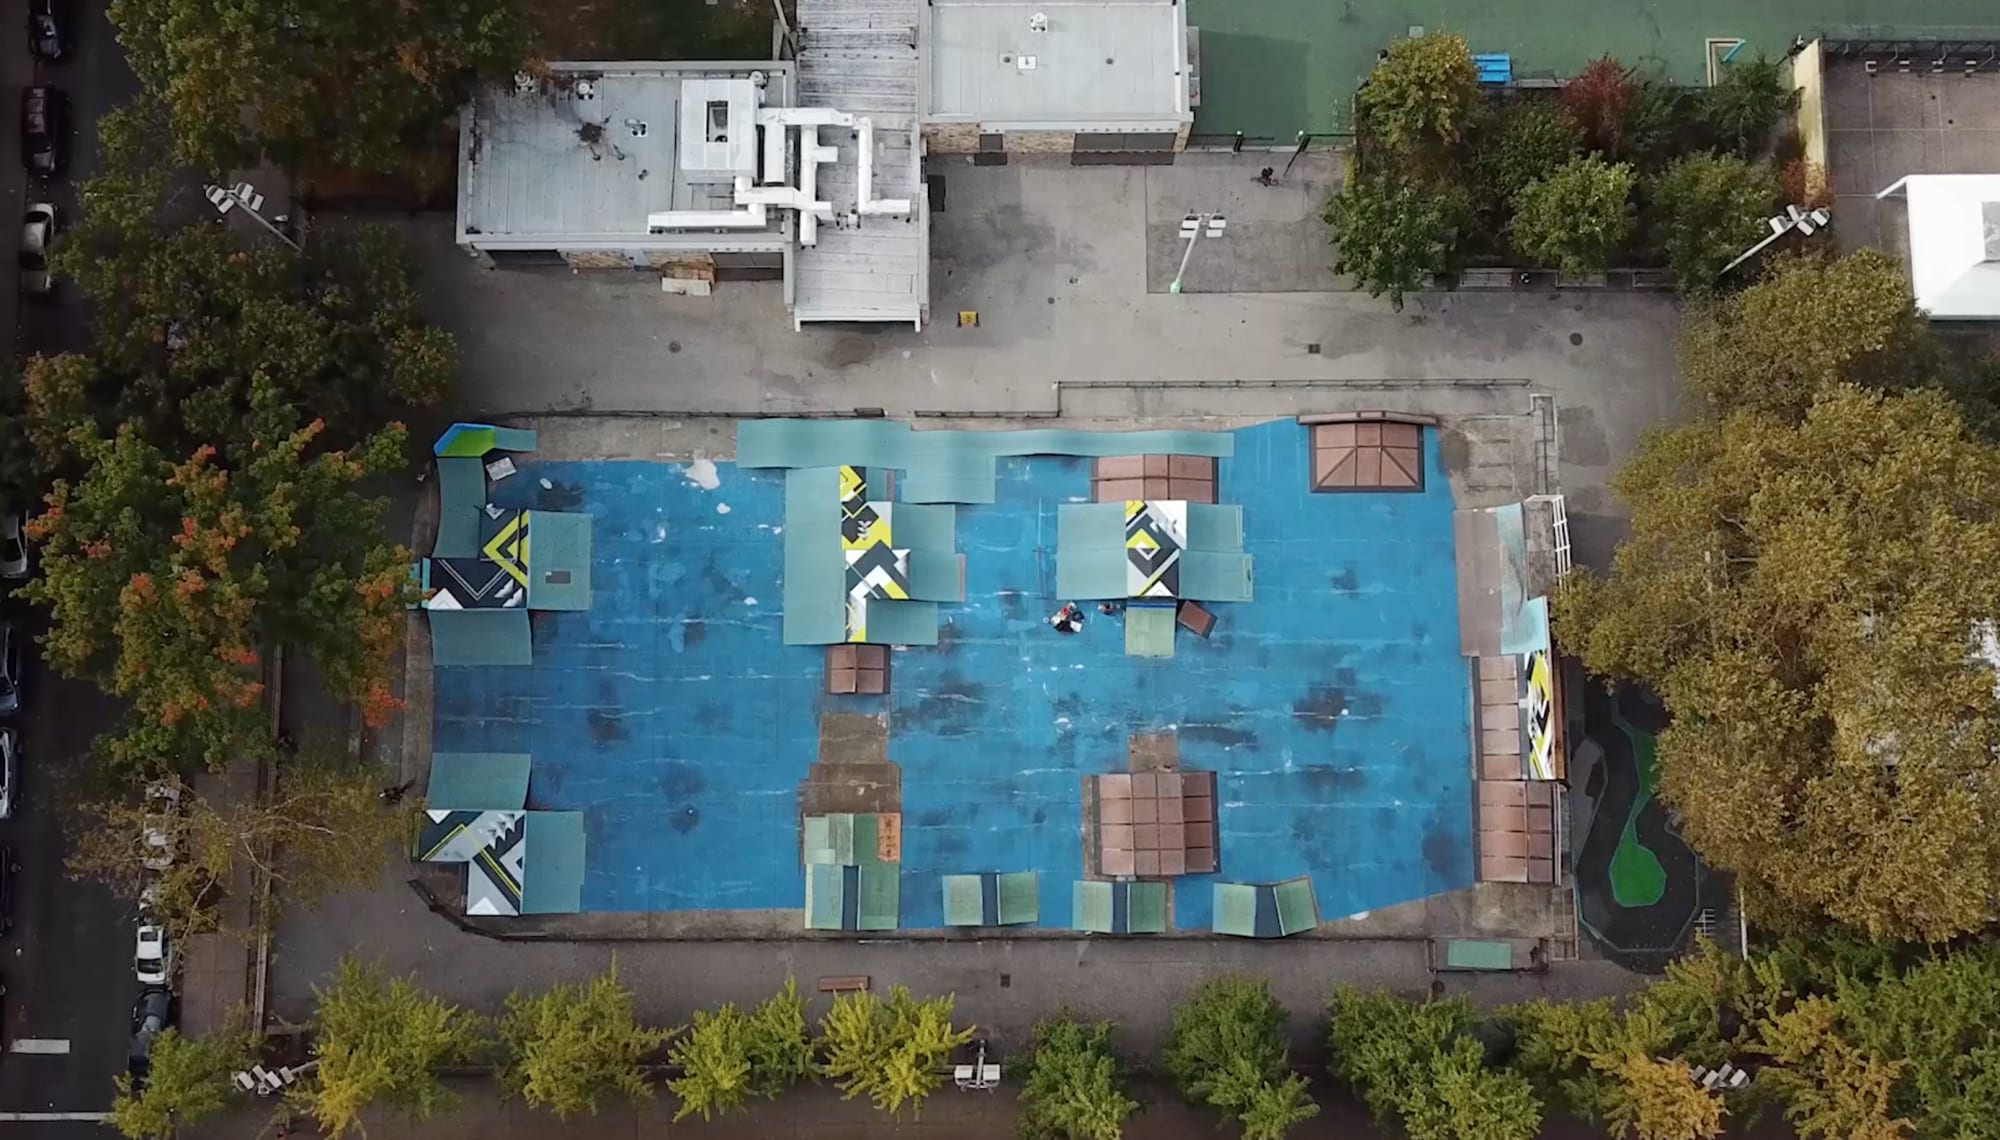 MULLALY BIKEPARK by LAMKAT, Street Murals at Mullaly Skate Park, Public Service Center